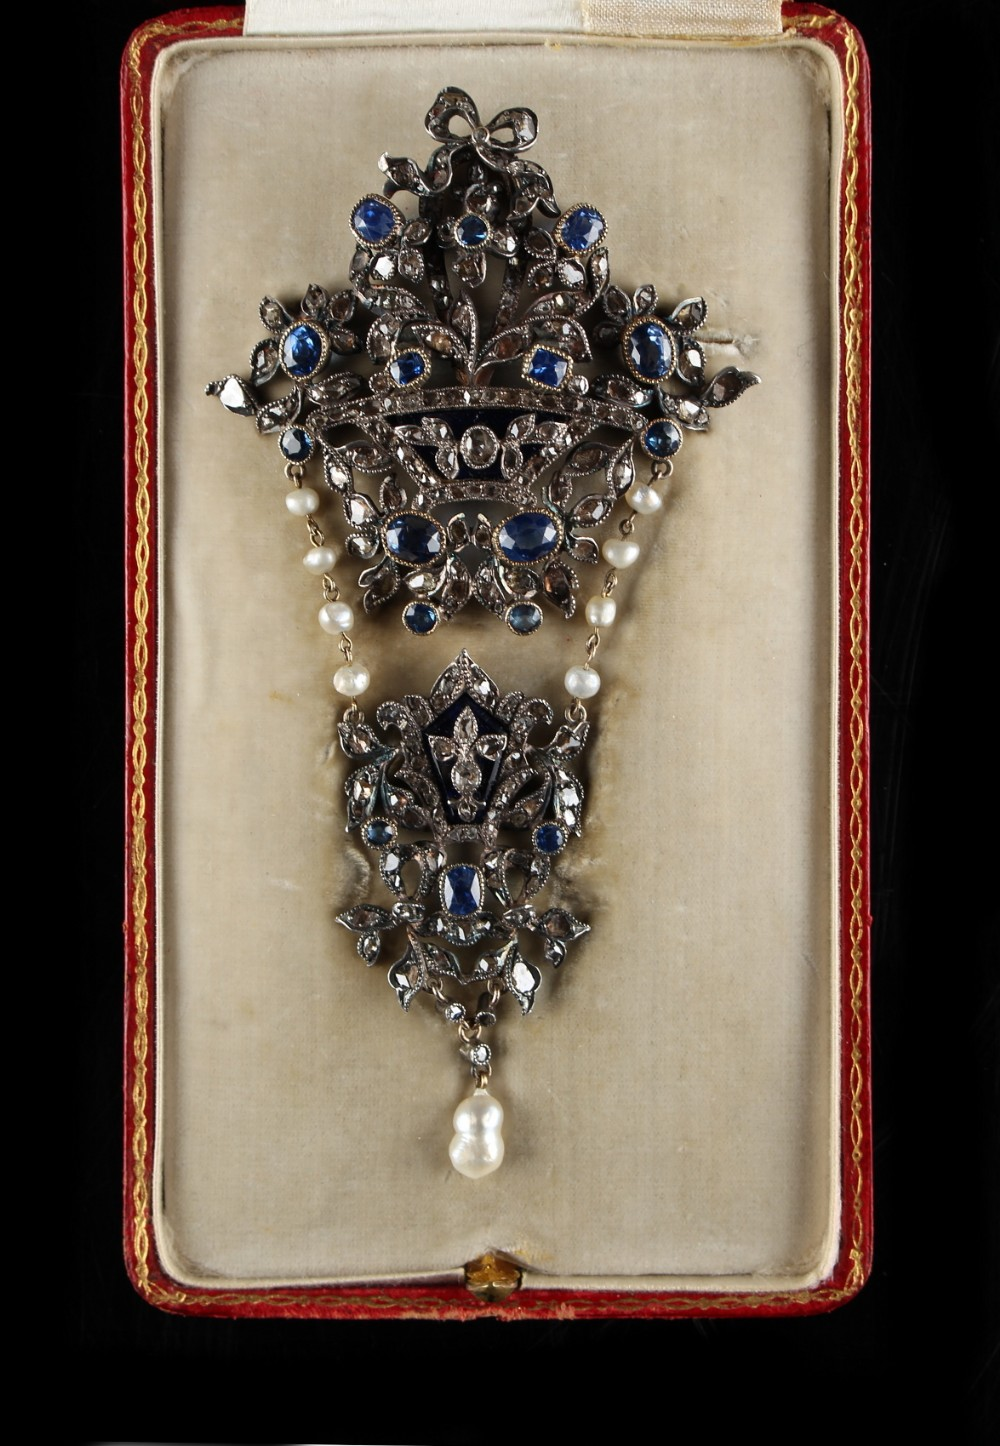 Lot 243 - An impressive 19th century Continental sapphire diamond & pearl foliate pendant brooch, of large